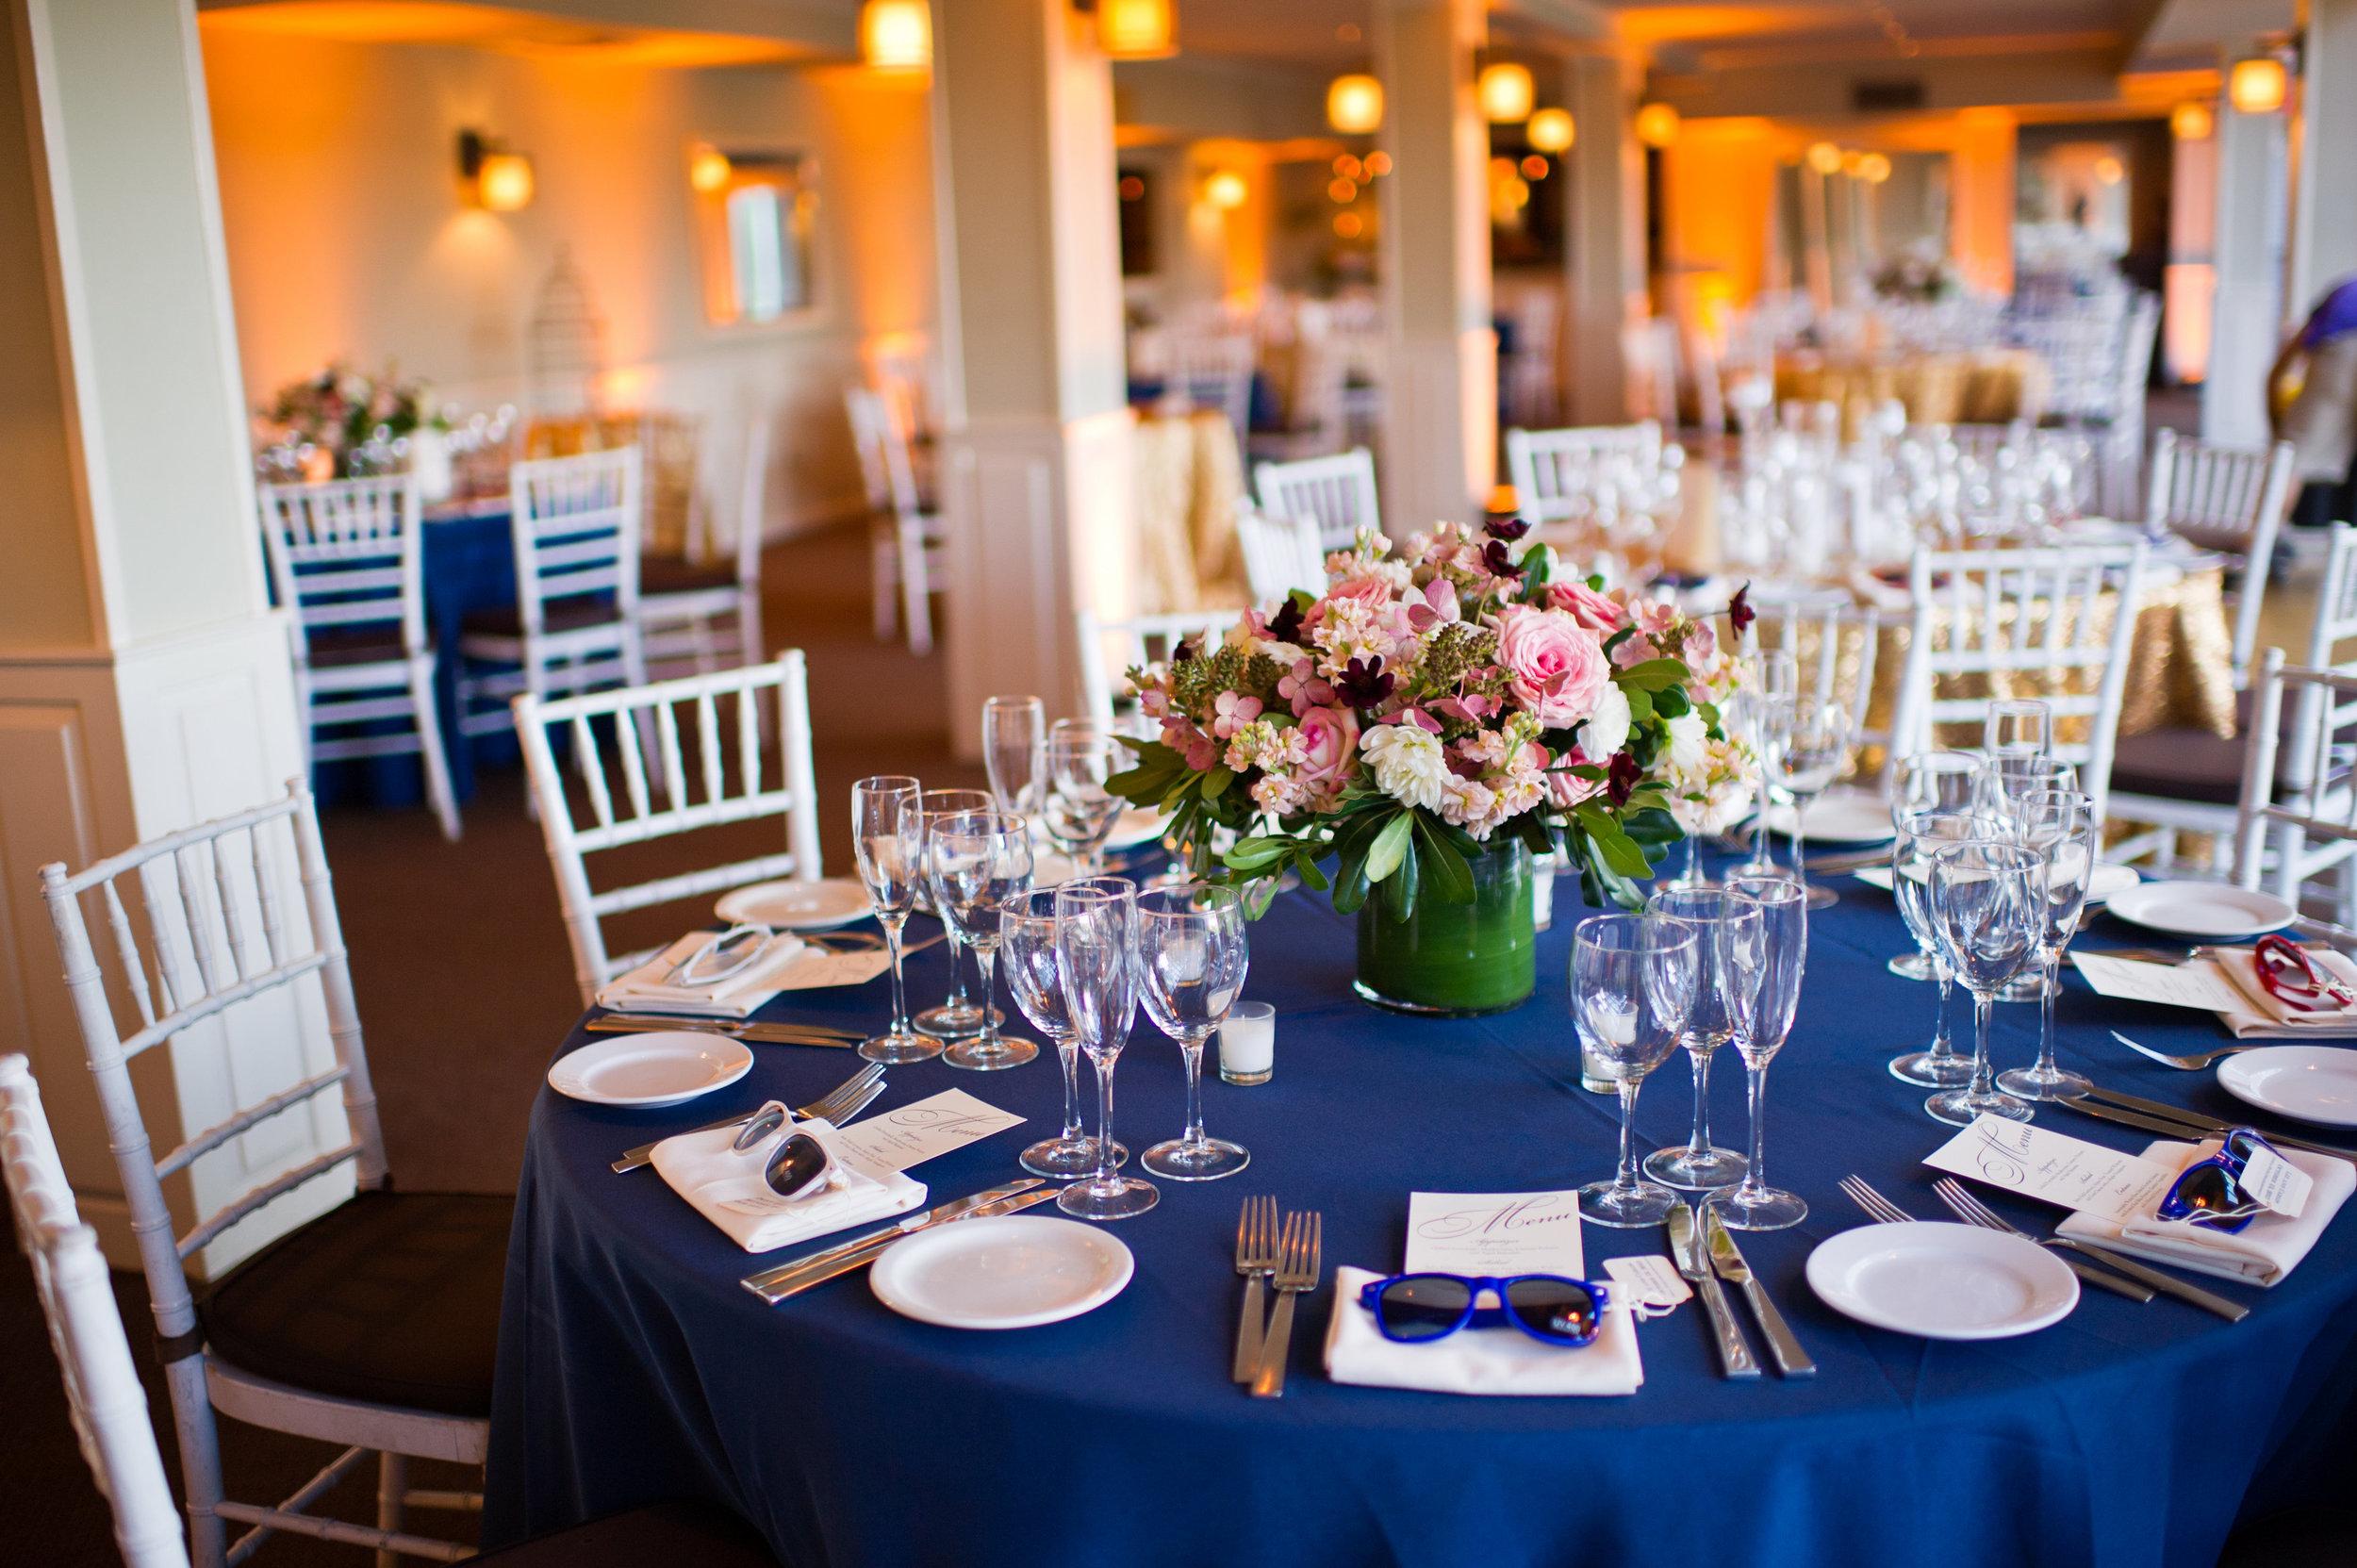 CT_Wedding_Planner_Crabtree_Kittle_House064.jpg